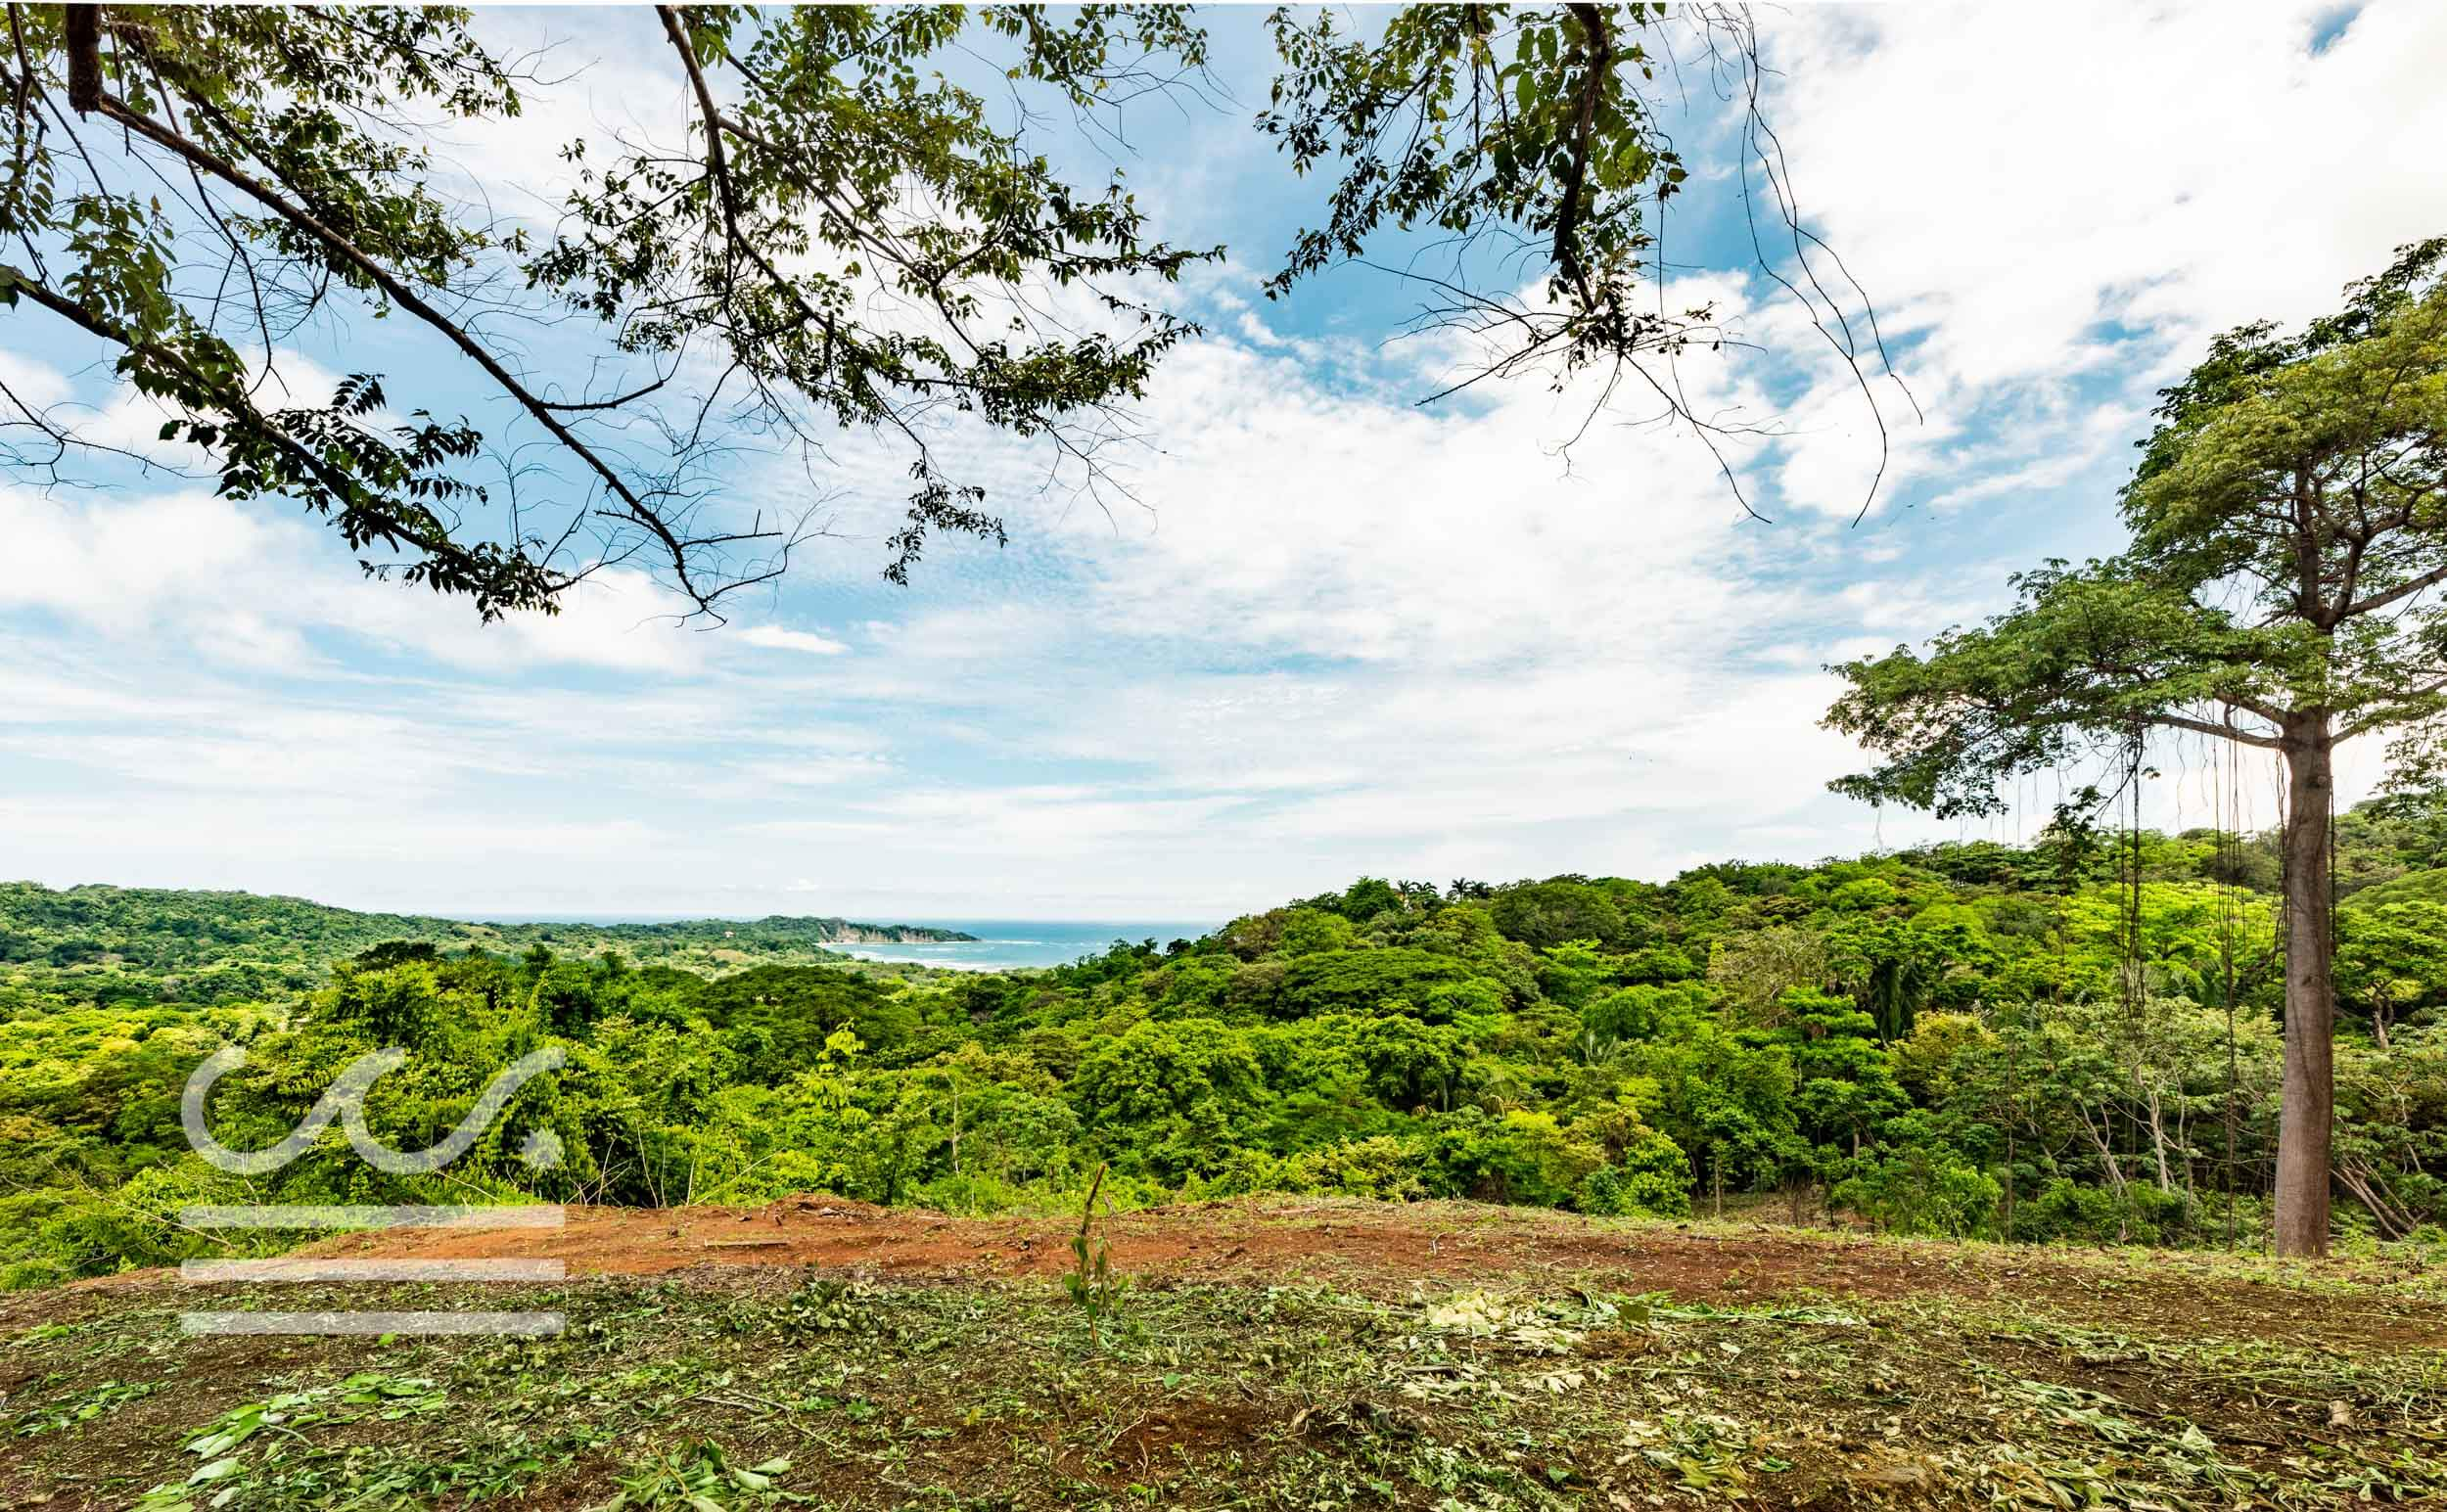 EE-101-Lot-Wanderlust-Realty-Real-Estate-Nosara-Costa-Rica-8compressed.jpg